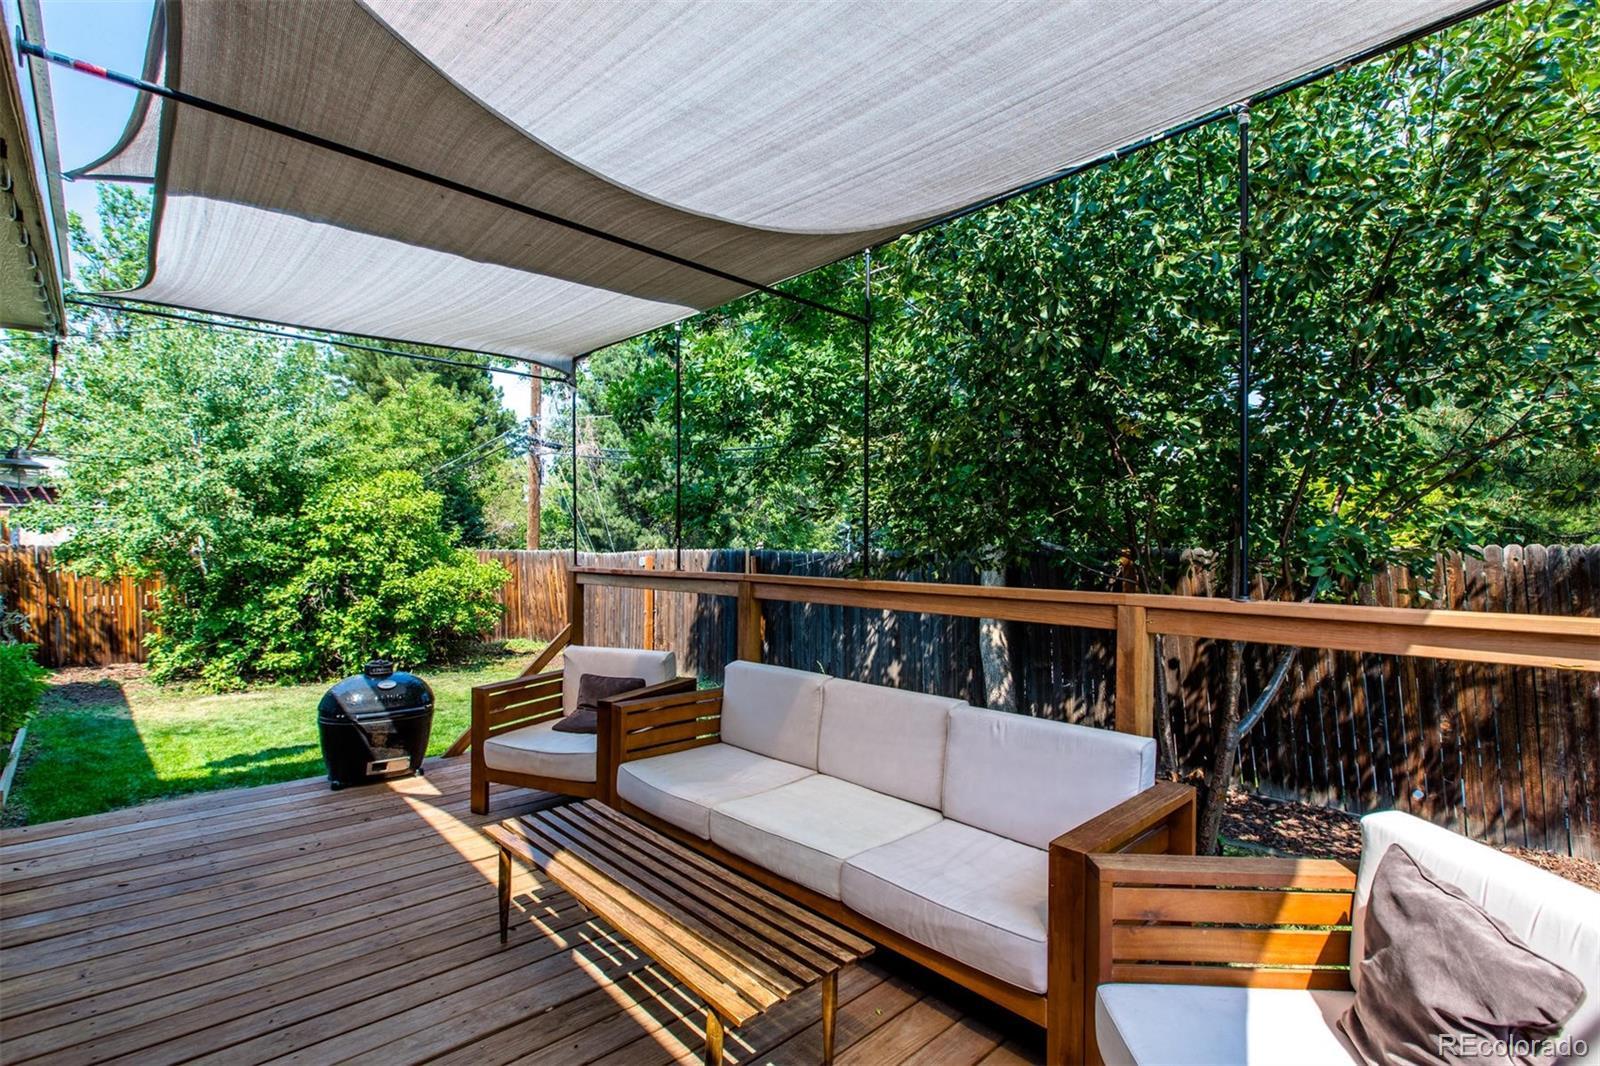 MLS# 7502668 - 33 - 1880 S Holly Street, Denver, CO 80222